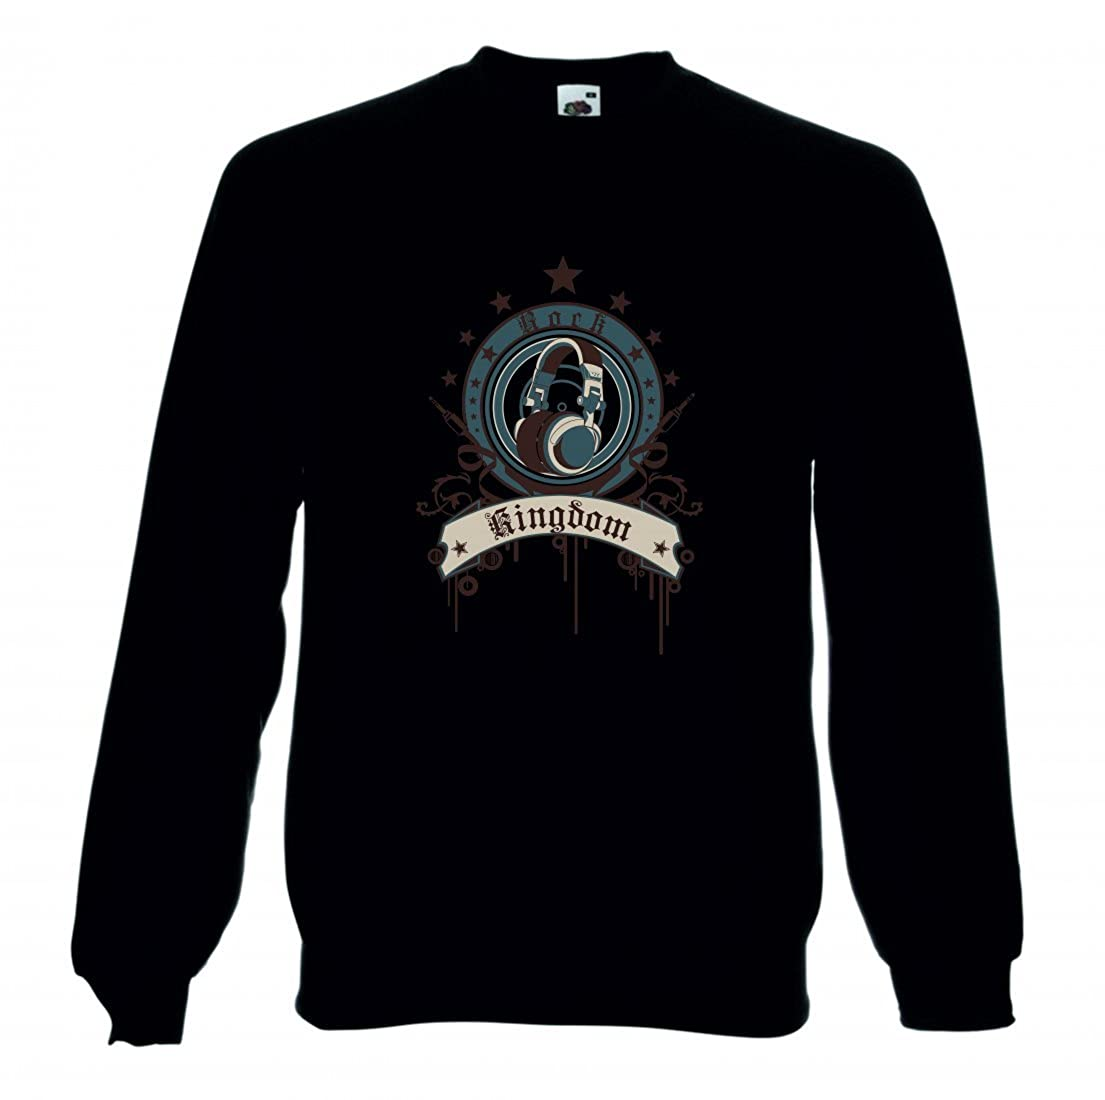 Damen Sweatshirt Rock Kingdom Music Rock n Roll Rocker Bike Auto Reise Travel Palmen 80er 90er f/ür Herren Kinder